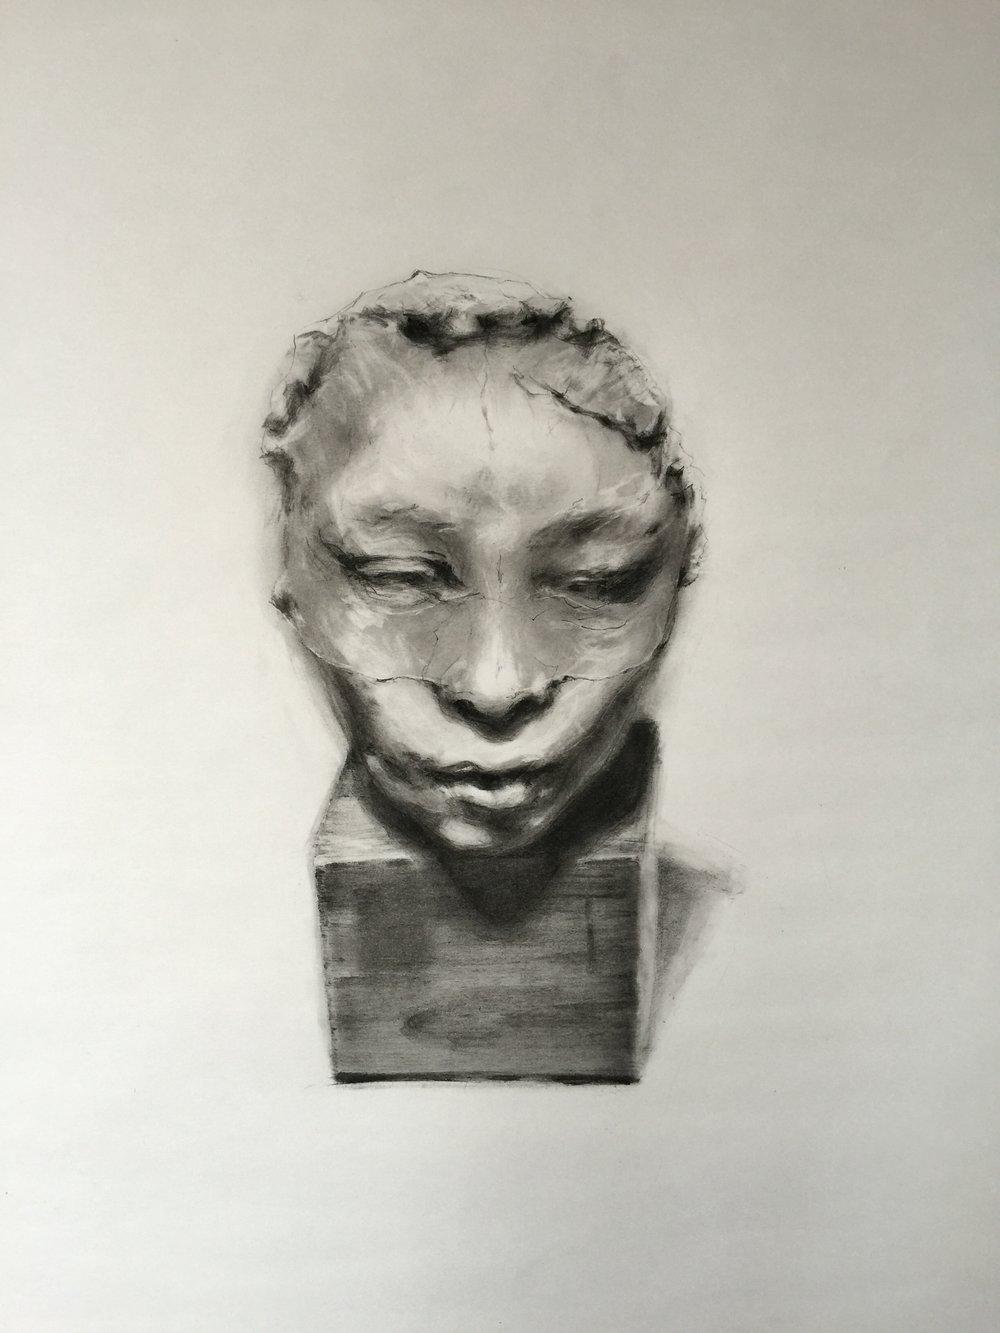 Agnes_Grochulska_Synthesis_Hanako_3_charcoal_18x24.jpg